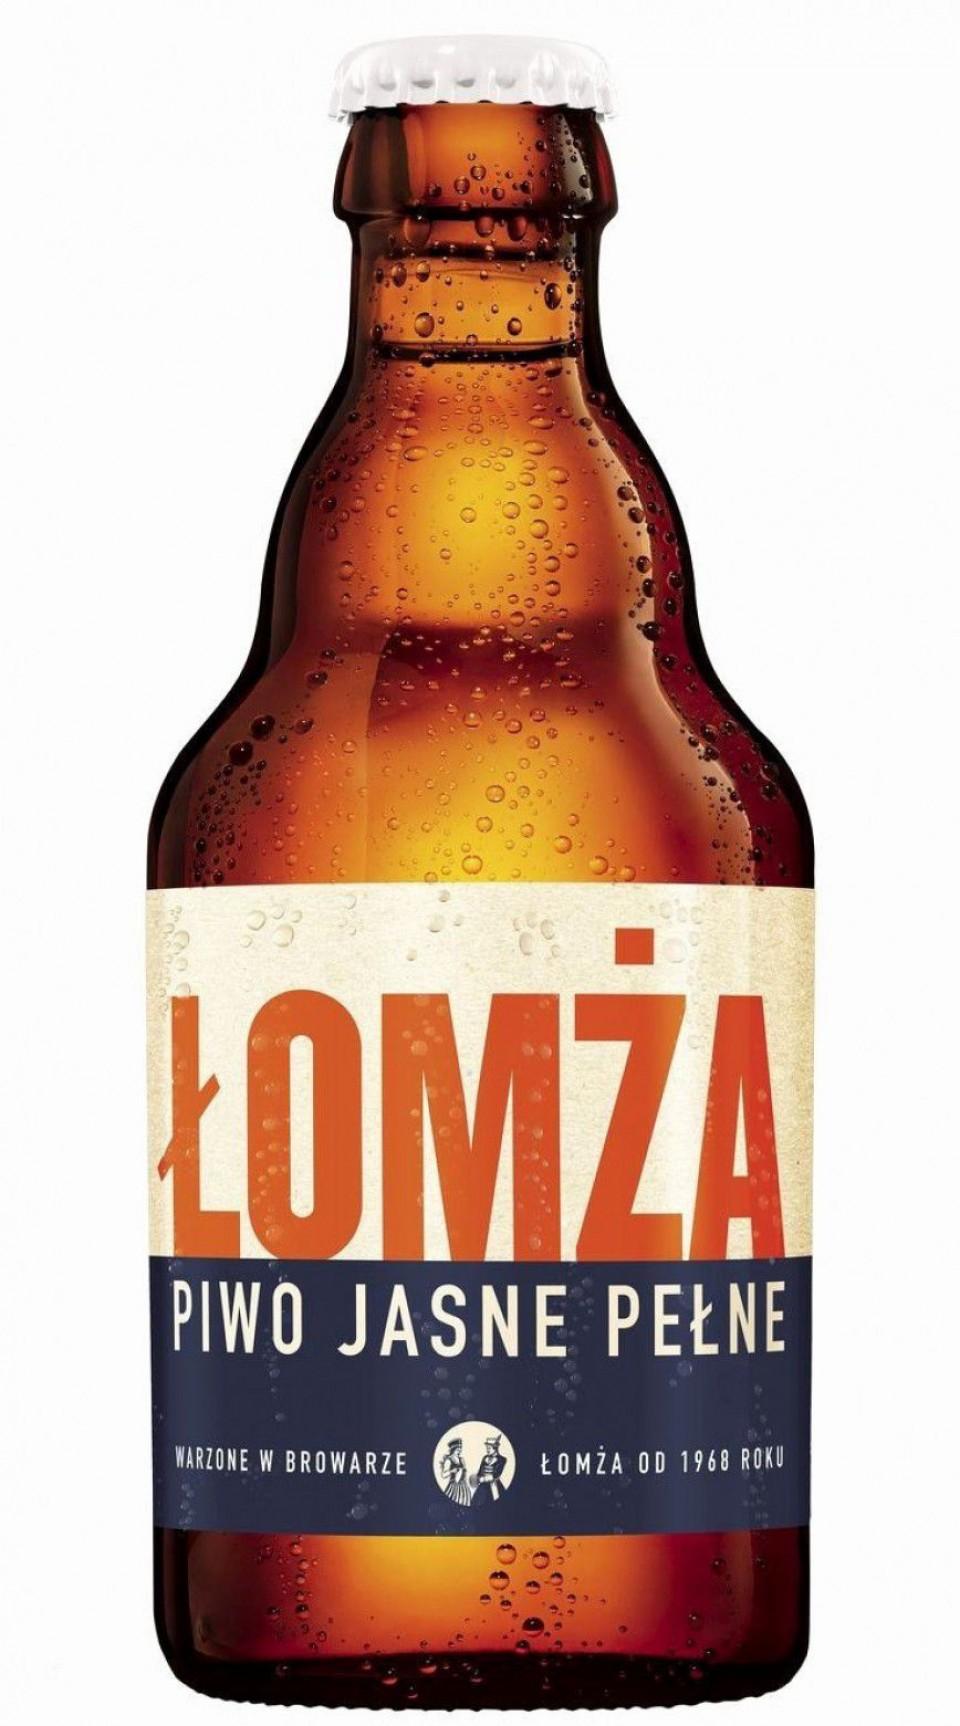 000 Unusual Microsoft Word Beer Label Template Inspiration  Bottle960